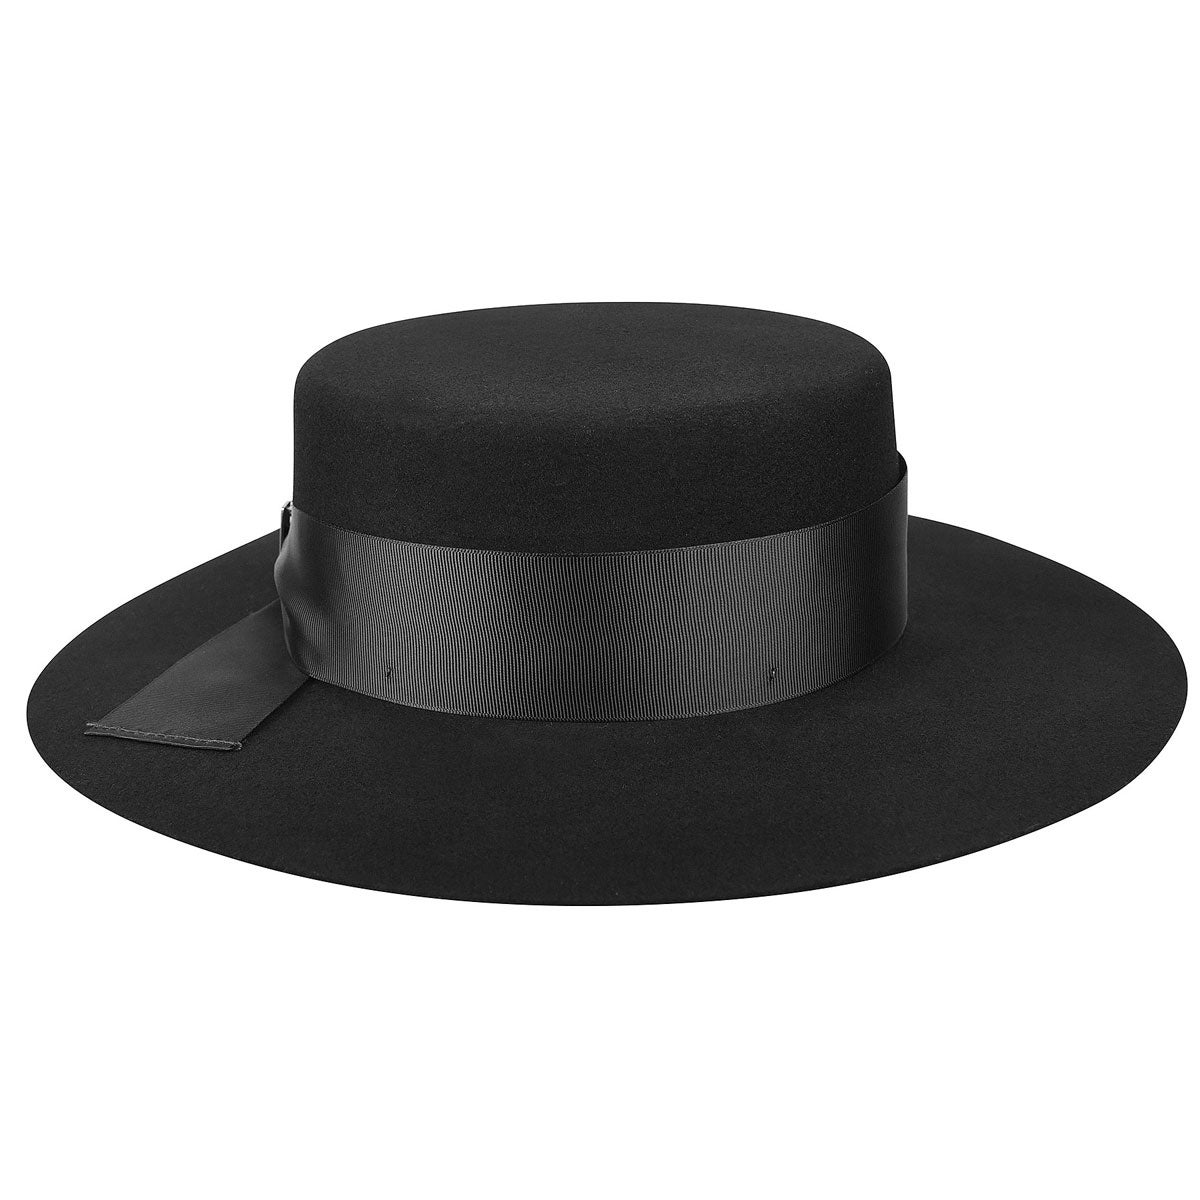 Edwardian Hats, Titanic Hats, Tea Party Hats Aldridge Wide Brim Boater $85.00 AT vintagedancer.com